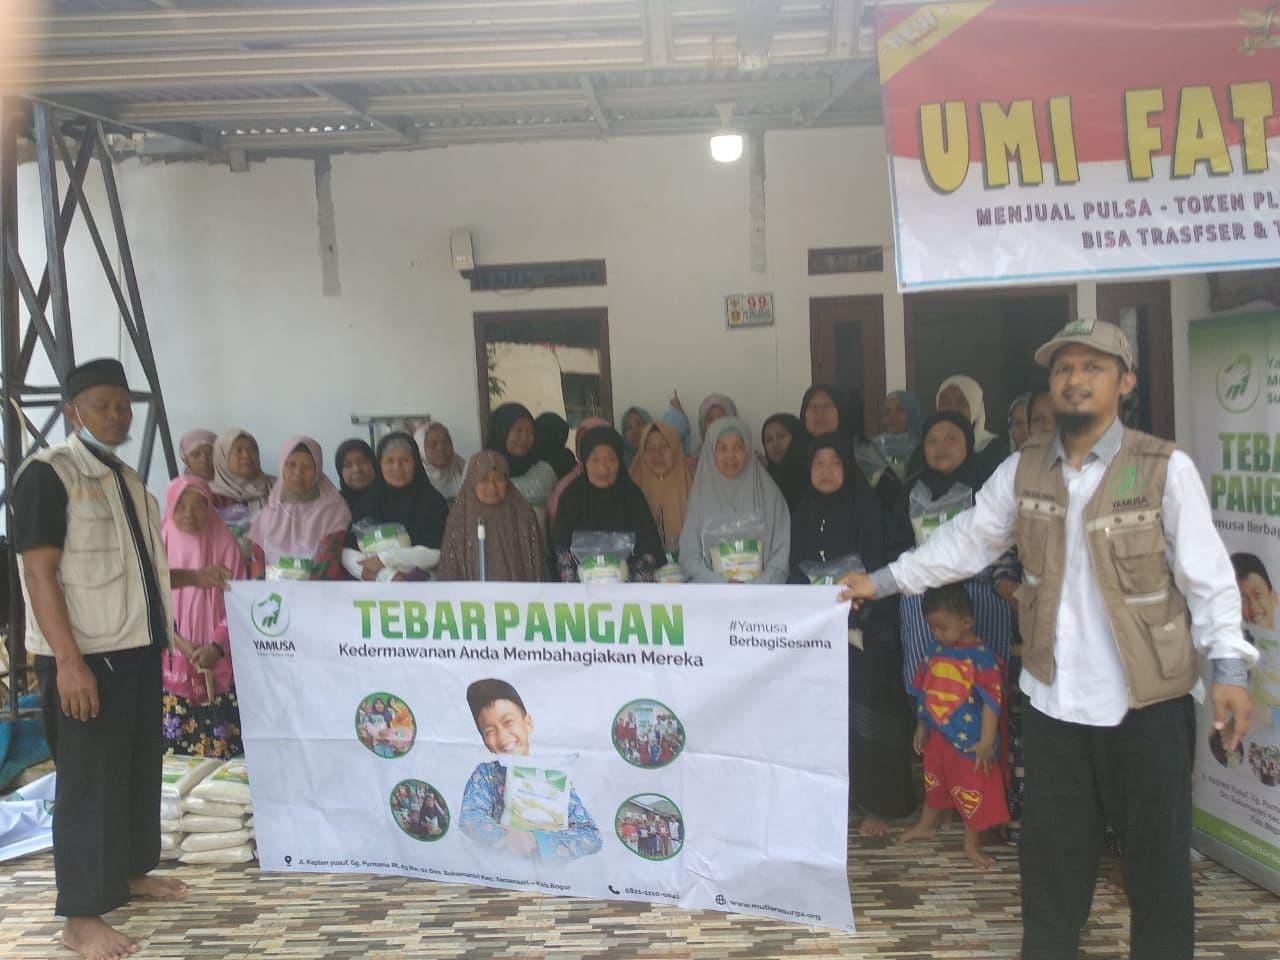 Paket Pangan untuk Waga Dhuafa di Tajurhalang Bogor